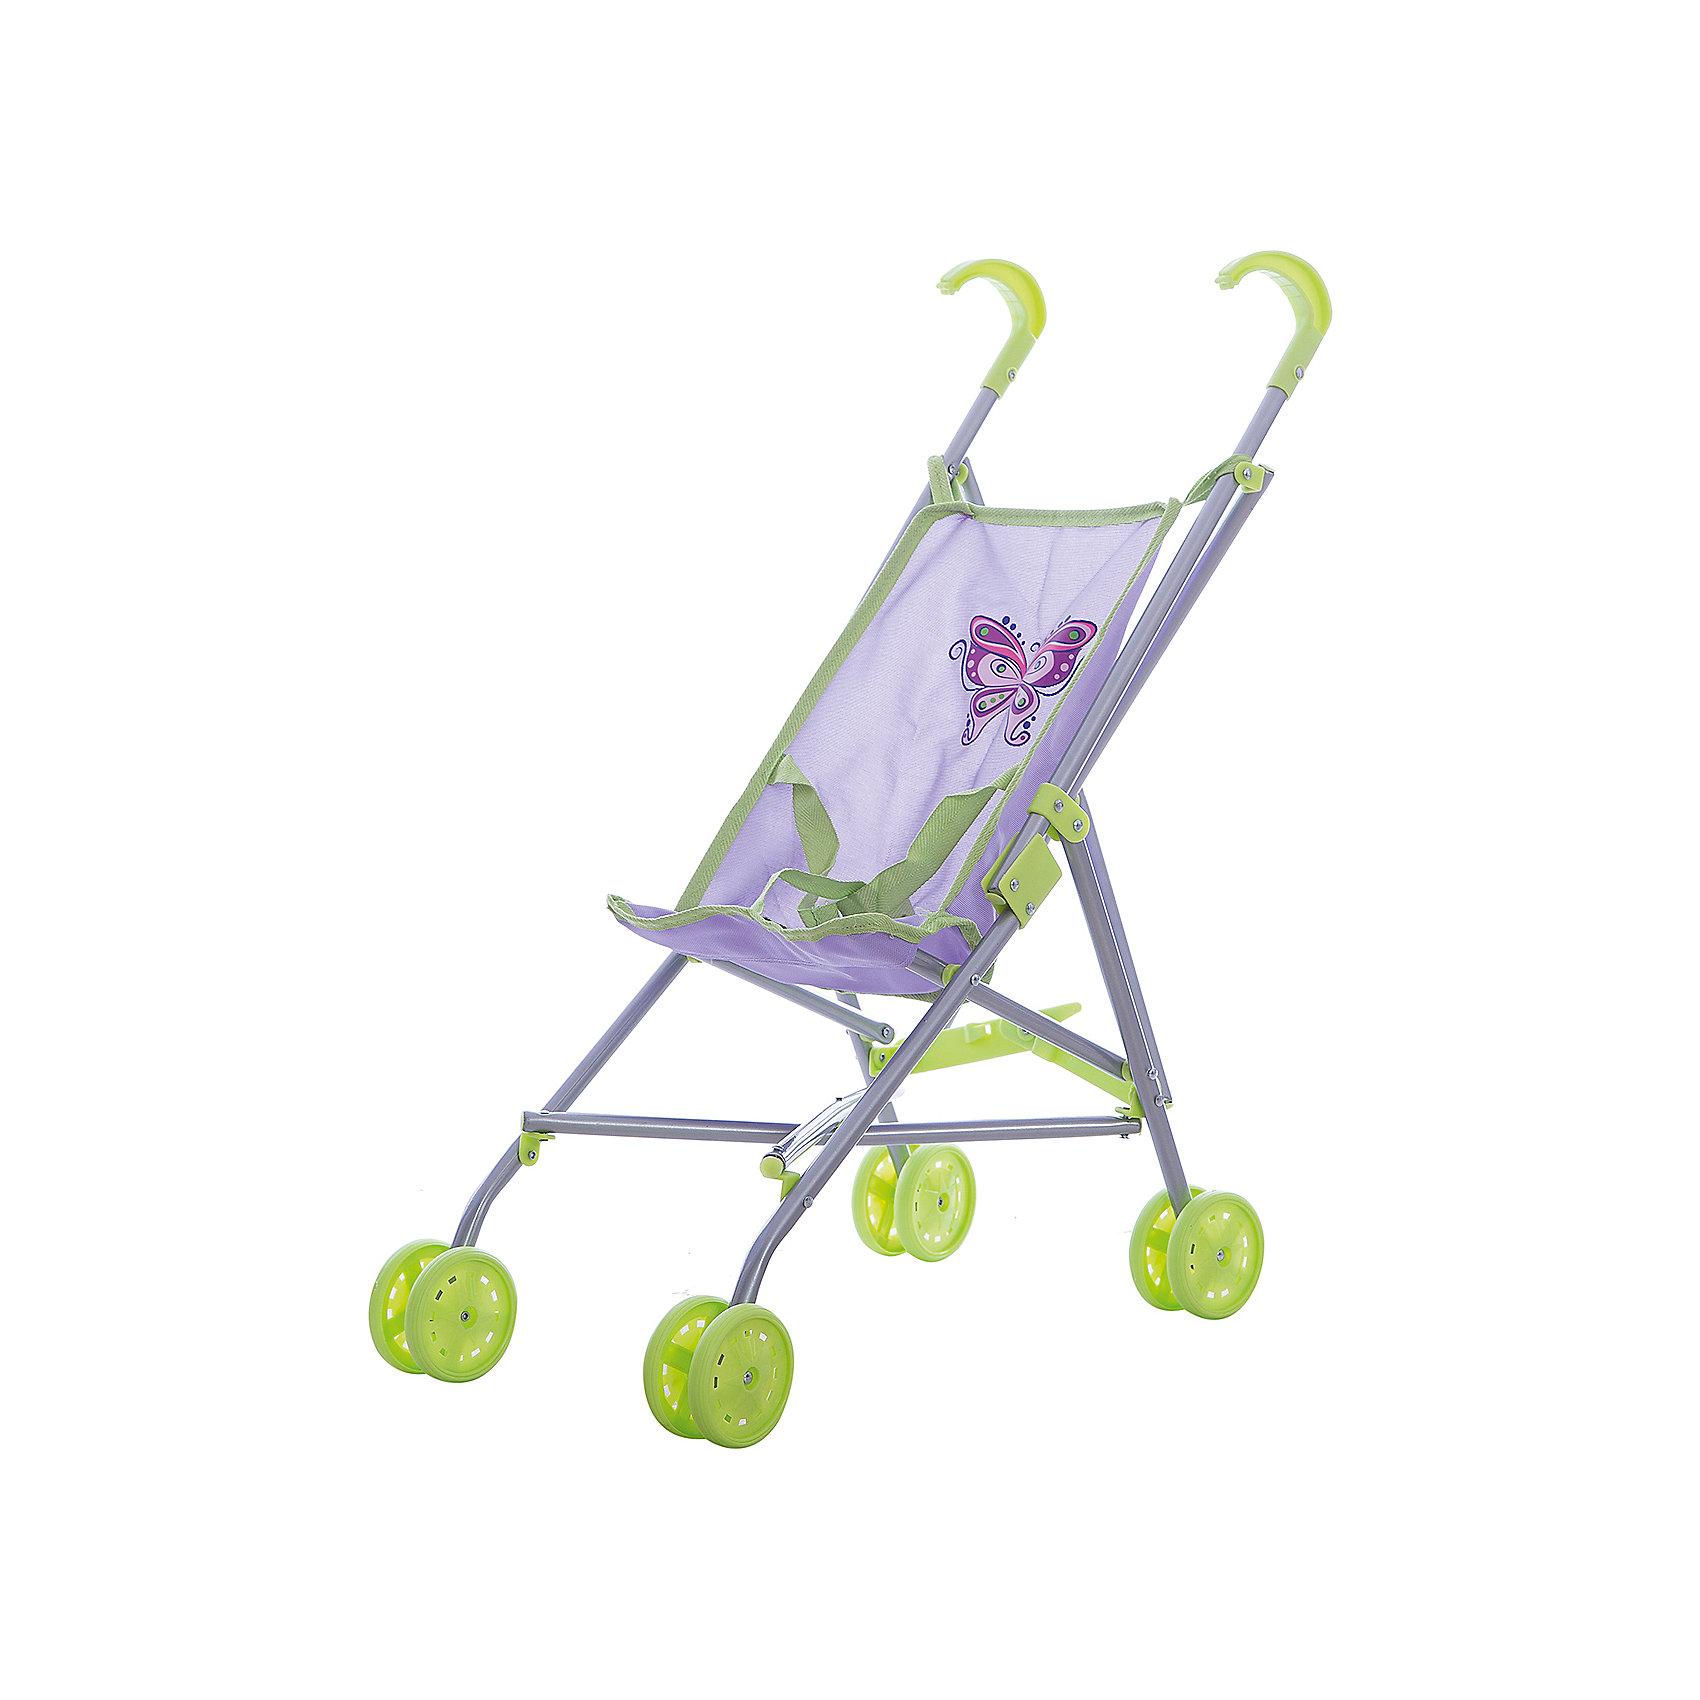 кукольная коляска трость 35 5 24 5 52 см fei li toys Mary Poppins Коляска-трость Бабочка 51*26,5*55см., Mary Poppins